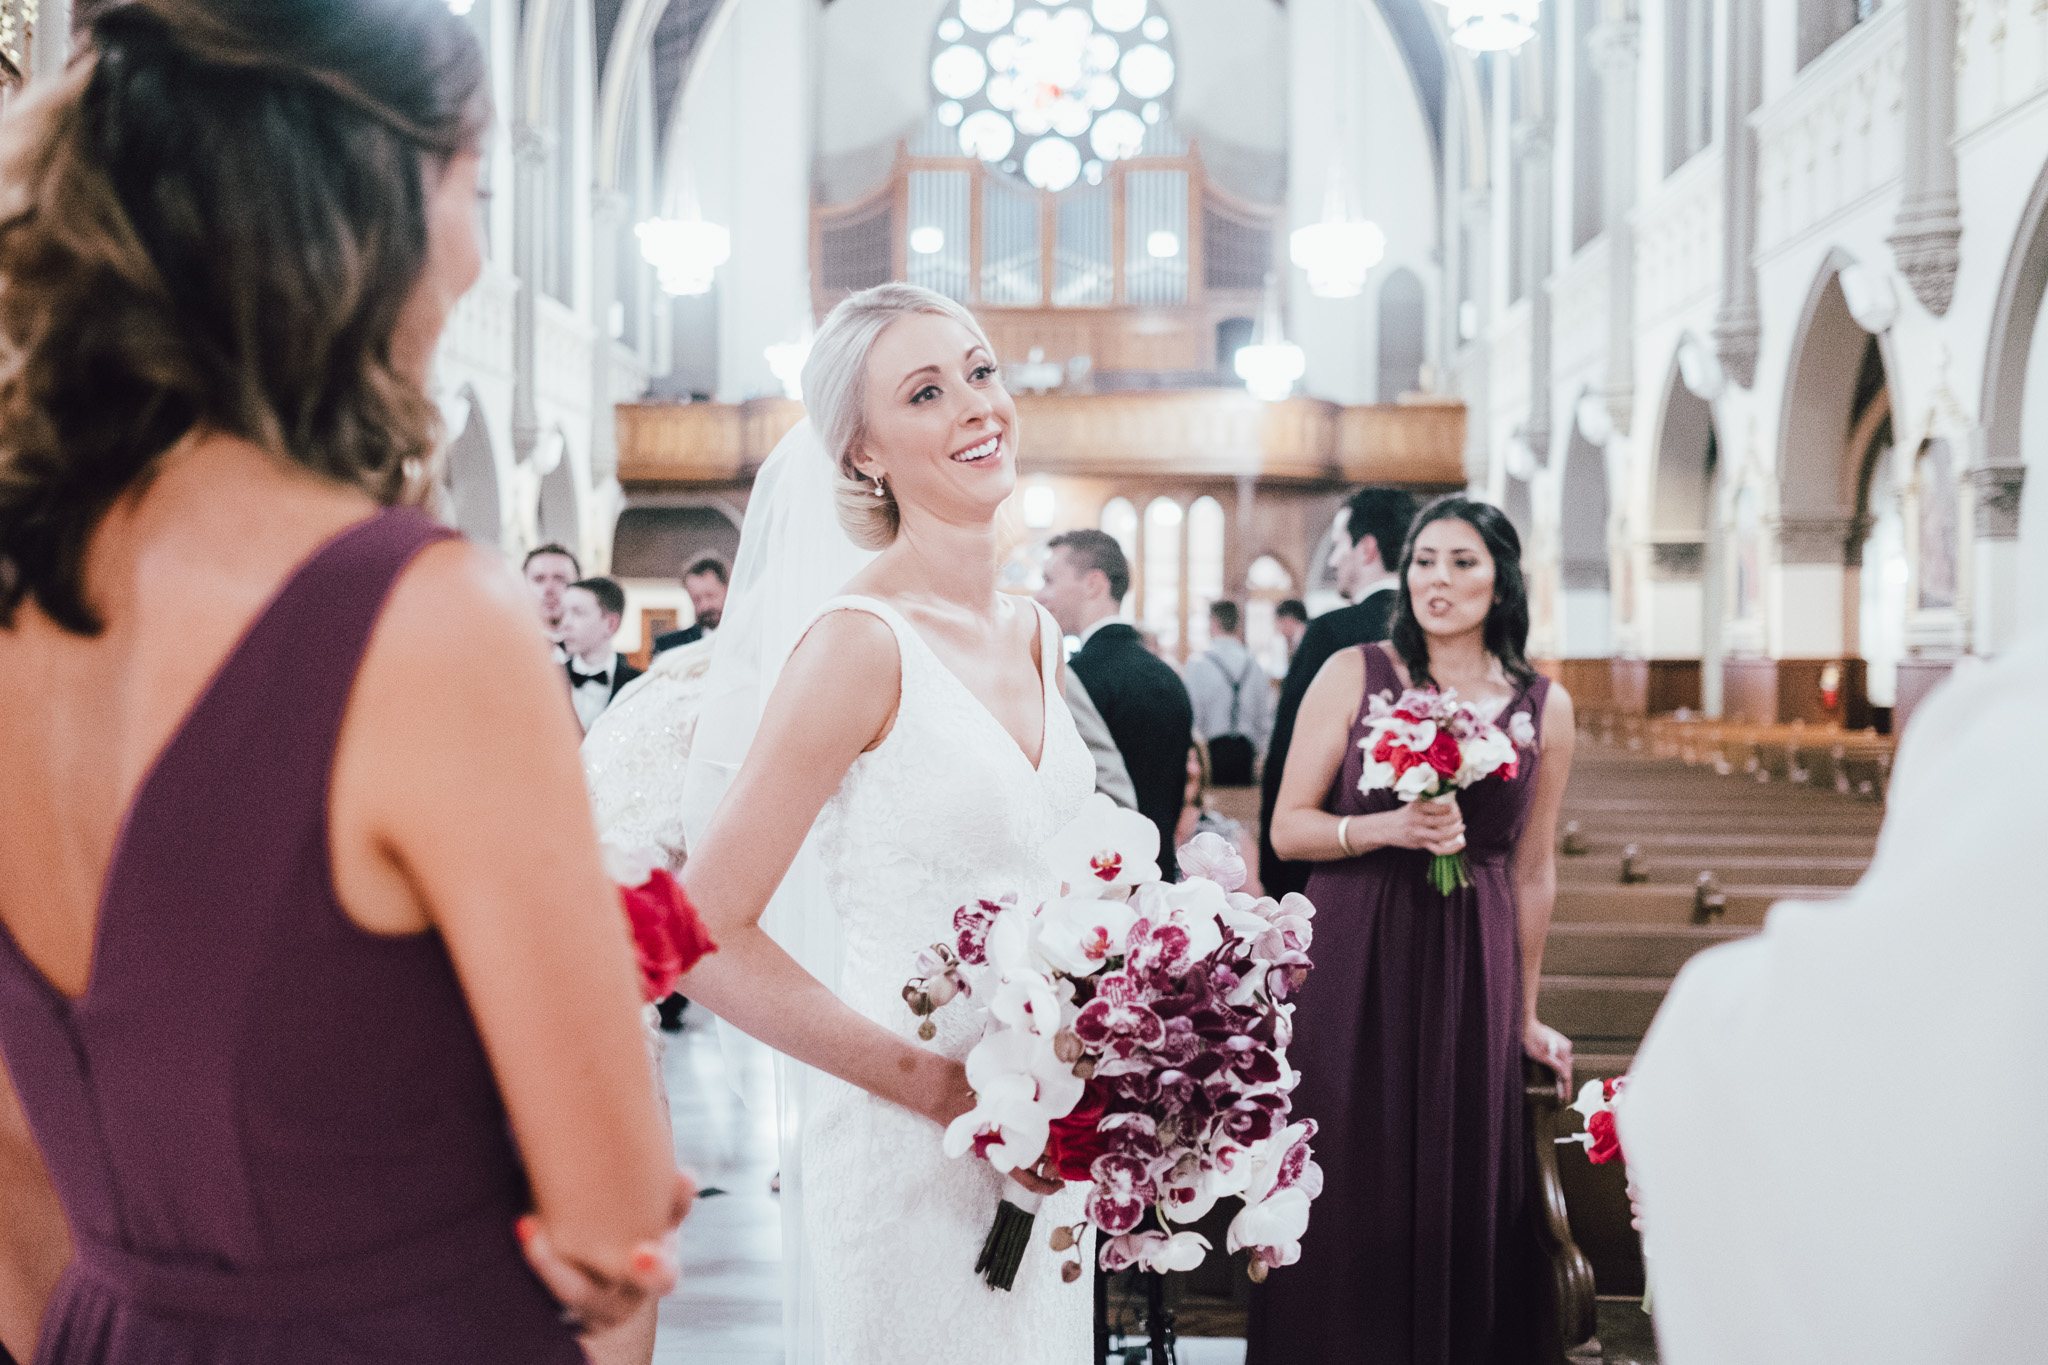 Brooke-Kyle-Indianapolis-Wedding-Blog-104.jpg